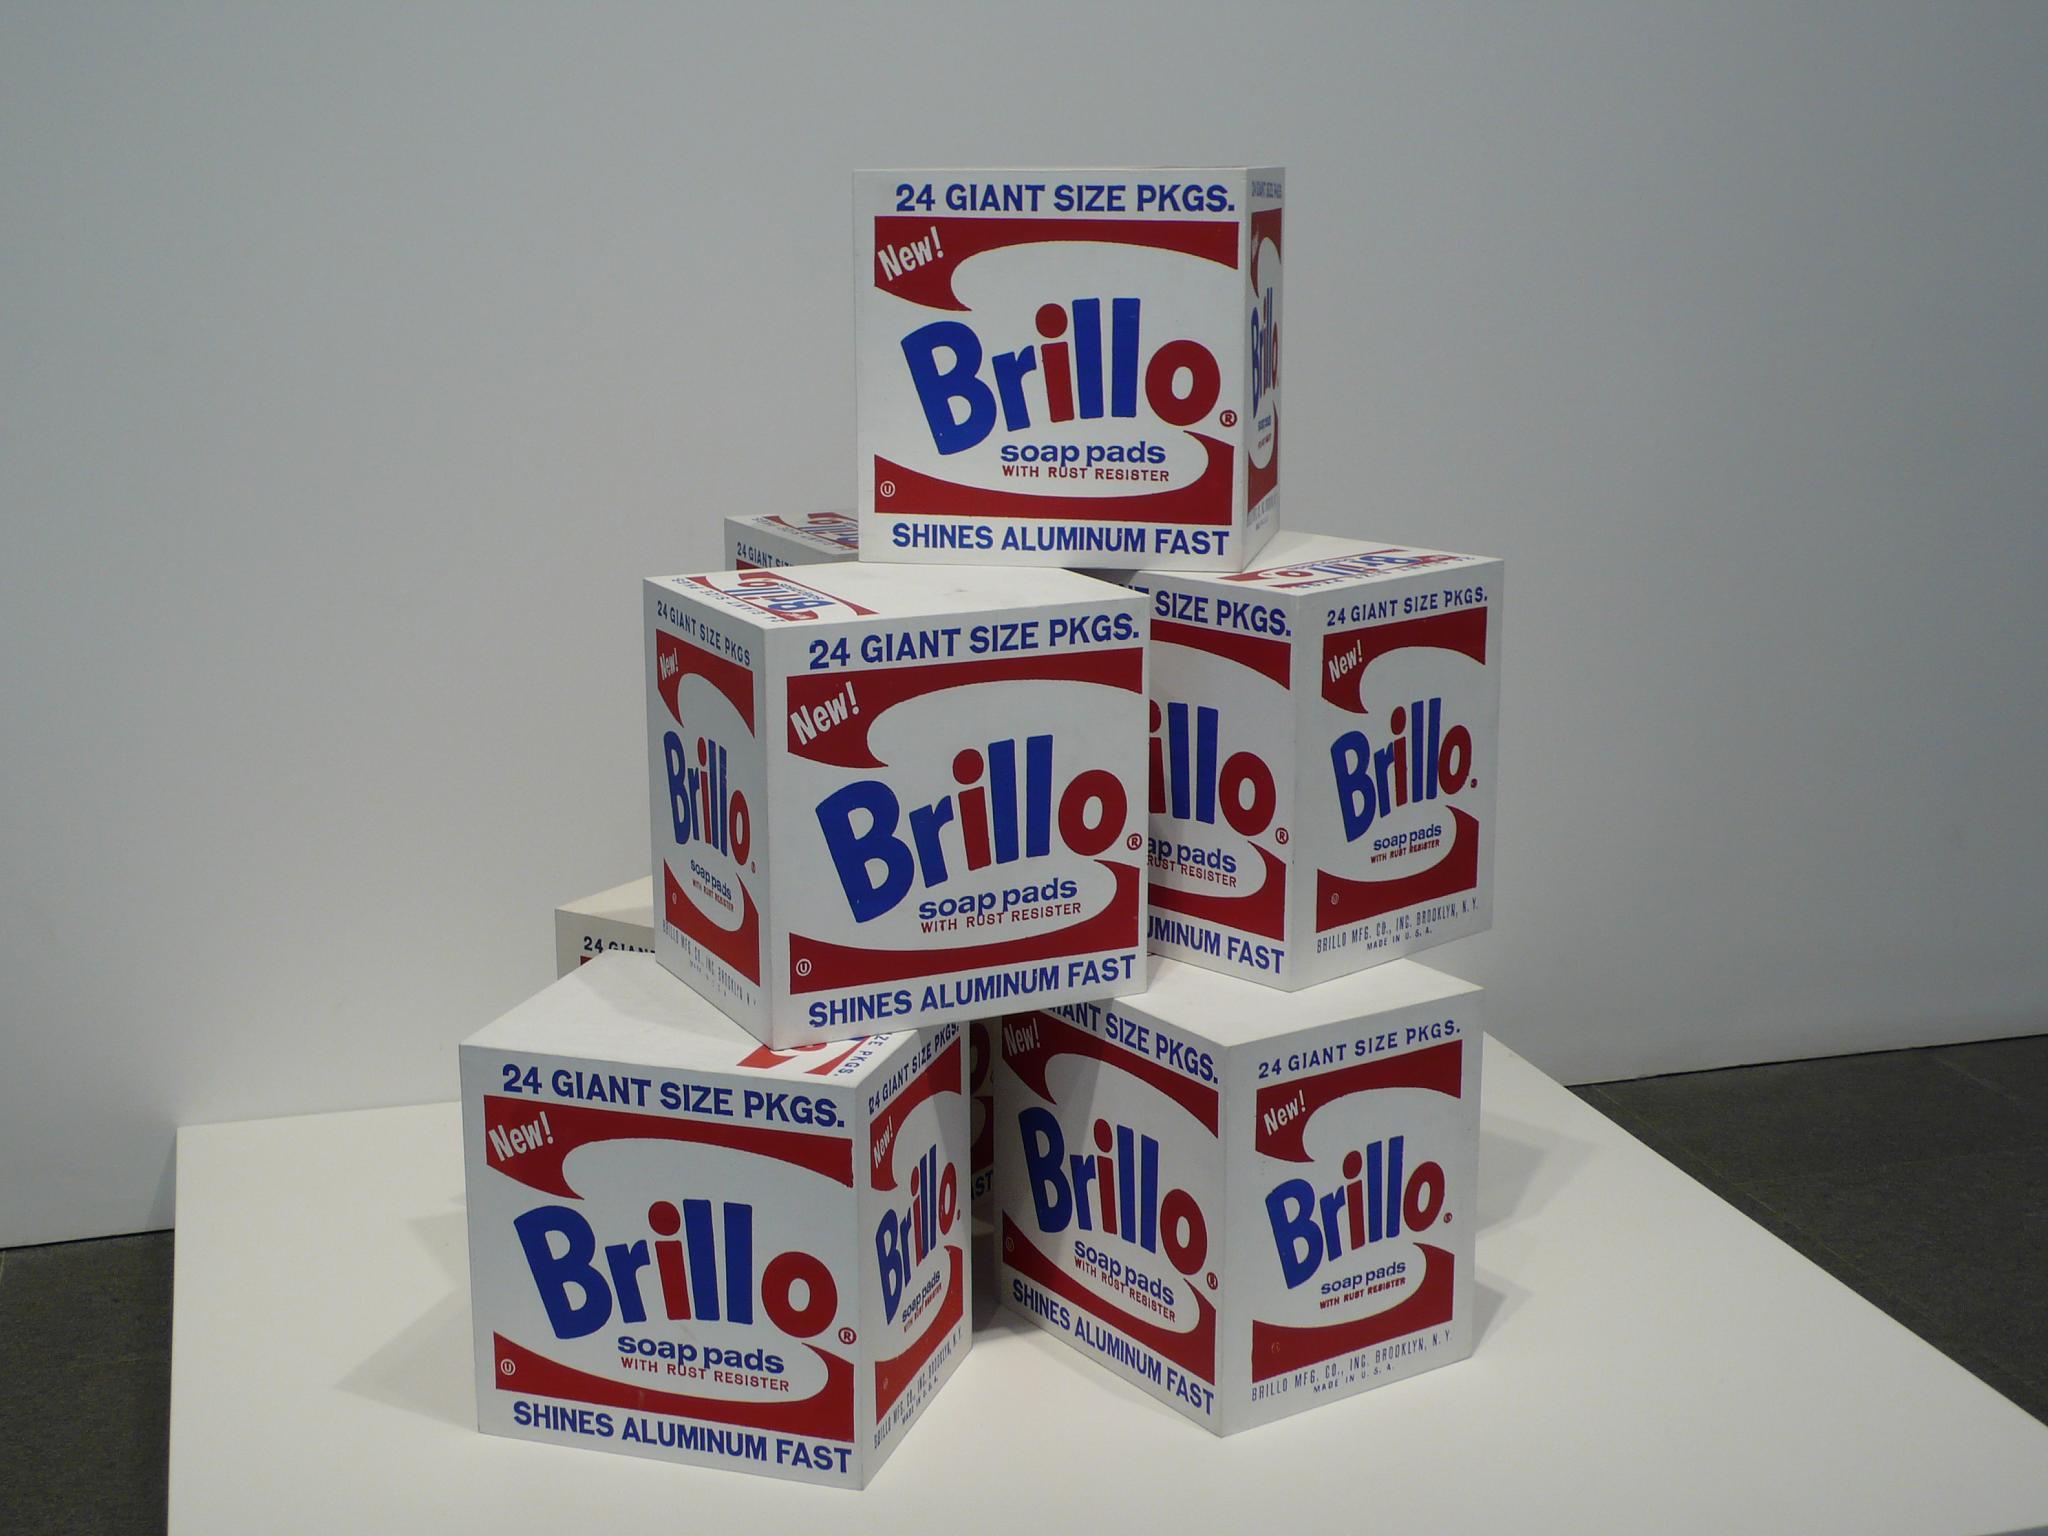 Andy Warhol, Brillo Box (Soap Pads), 1964. Photograph by  Richard Winchell .